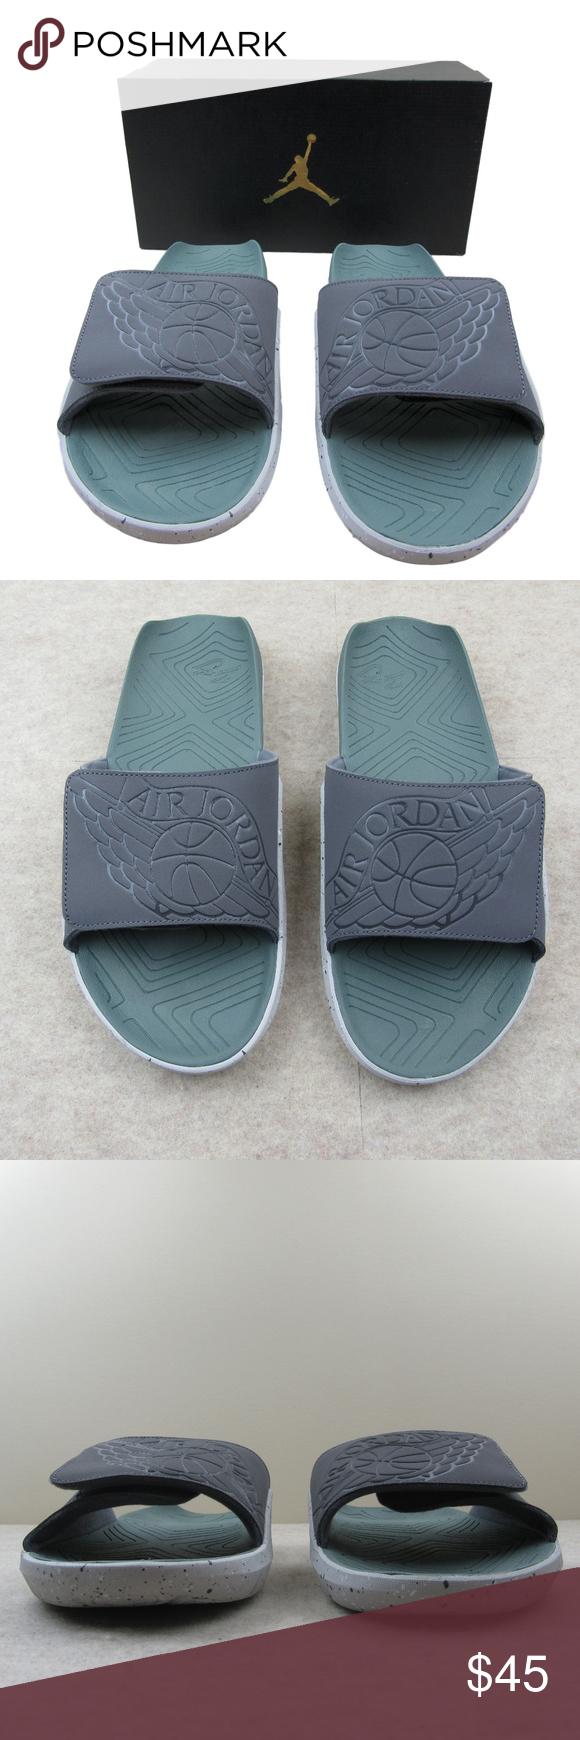 b14f30d64bda Jordan Hydro 7 Slides Sandals Size 13 Mens Jordan Hydro 7 Slides Sandals  Men s Dark Grey Clay Green Tech Style - AA2517 035 Men s Size 13 Brand New  in ...